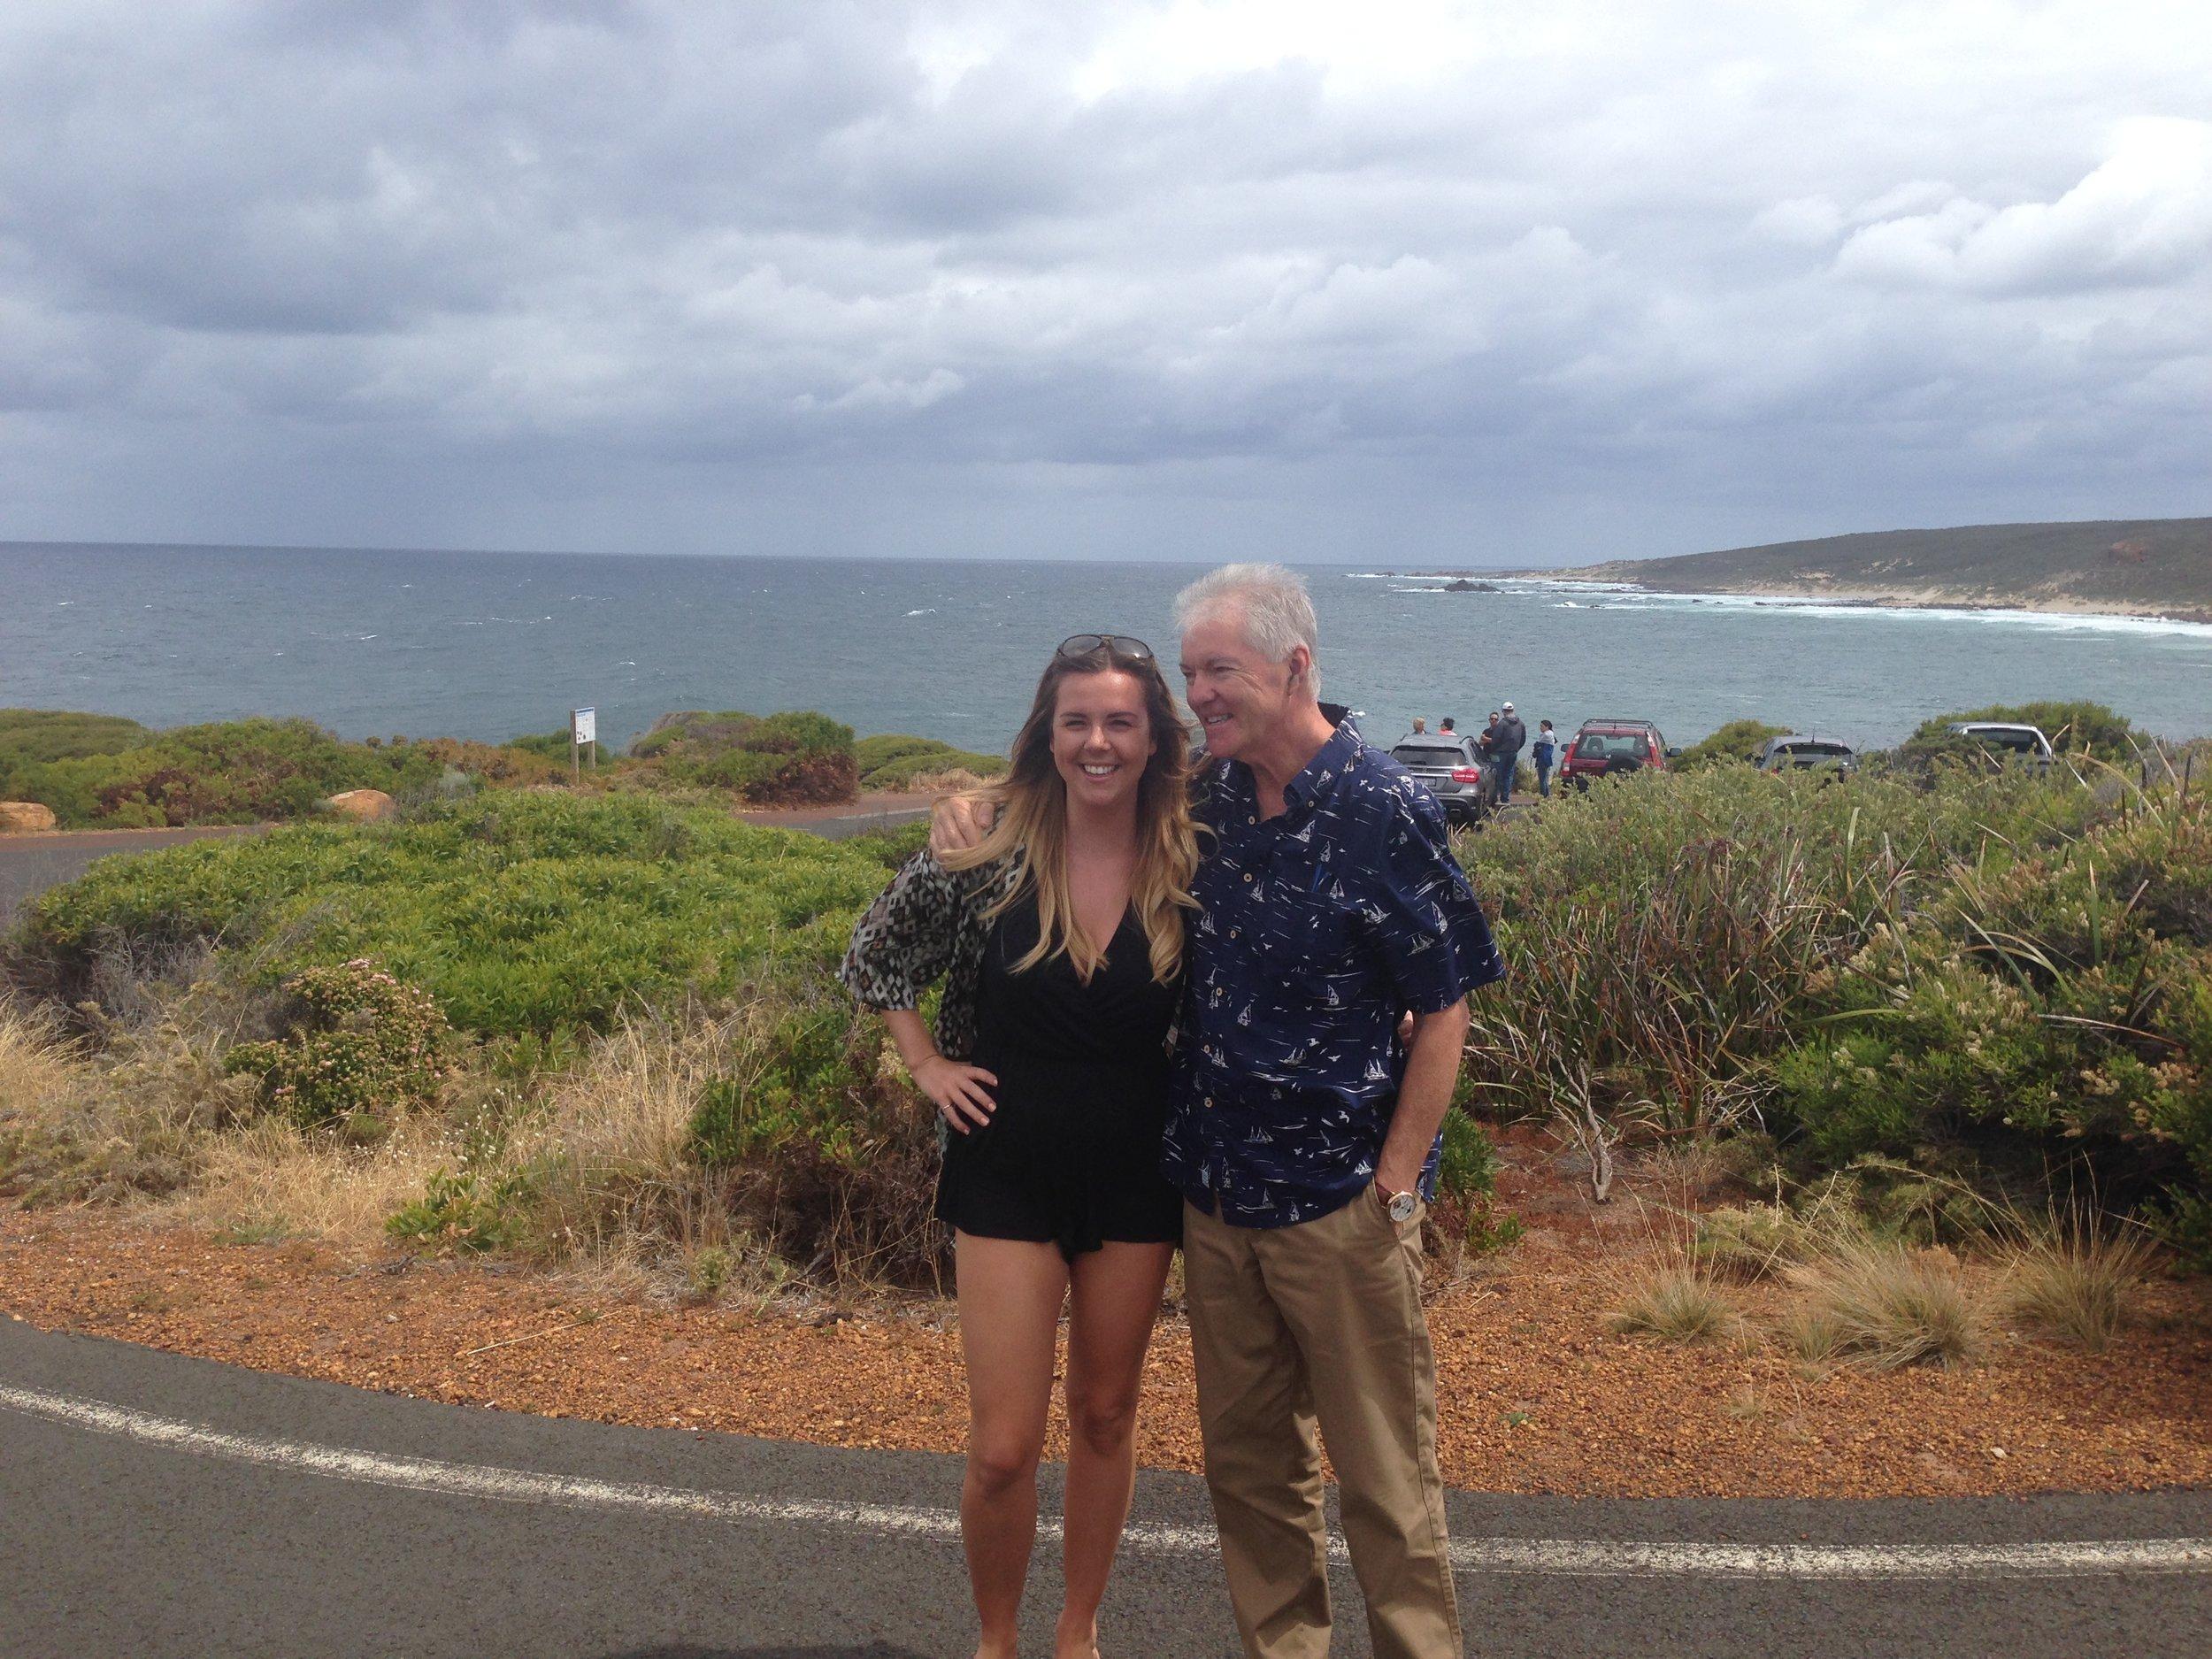 ME & lovely girl from UK smiling at SUGARLOAF.JPG